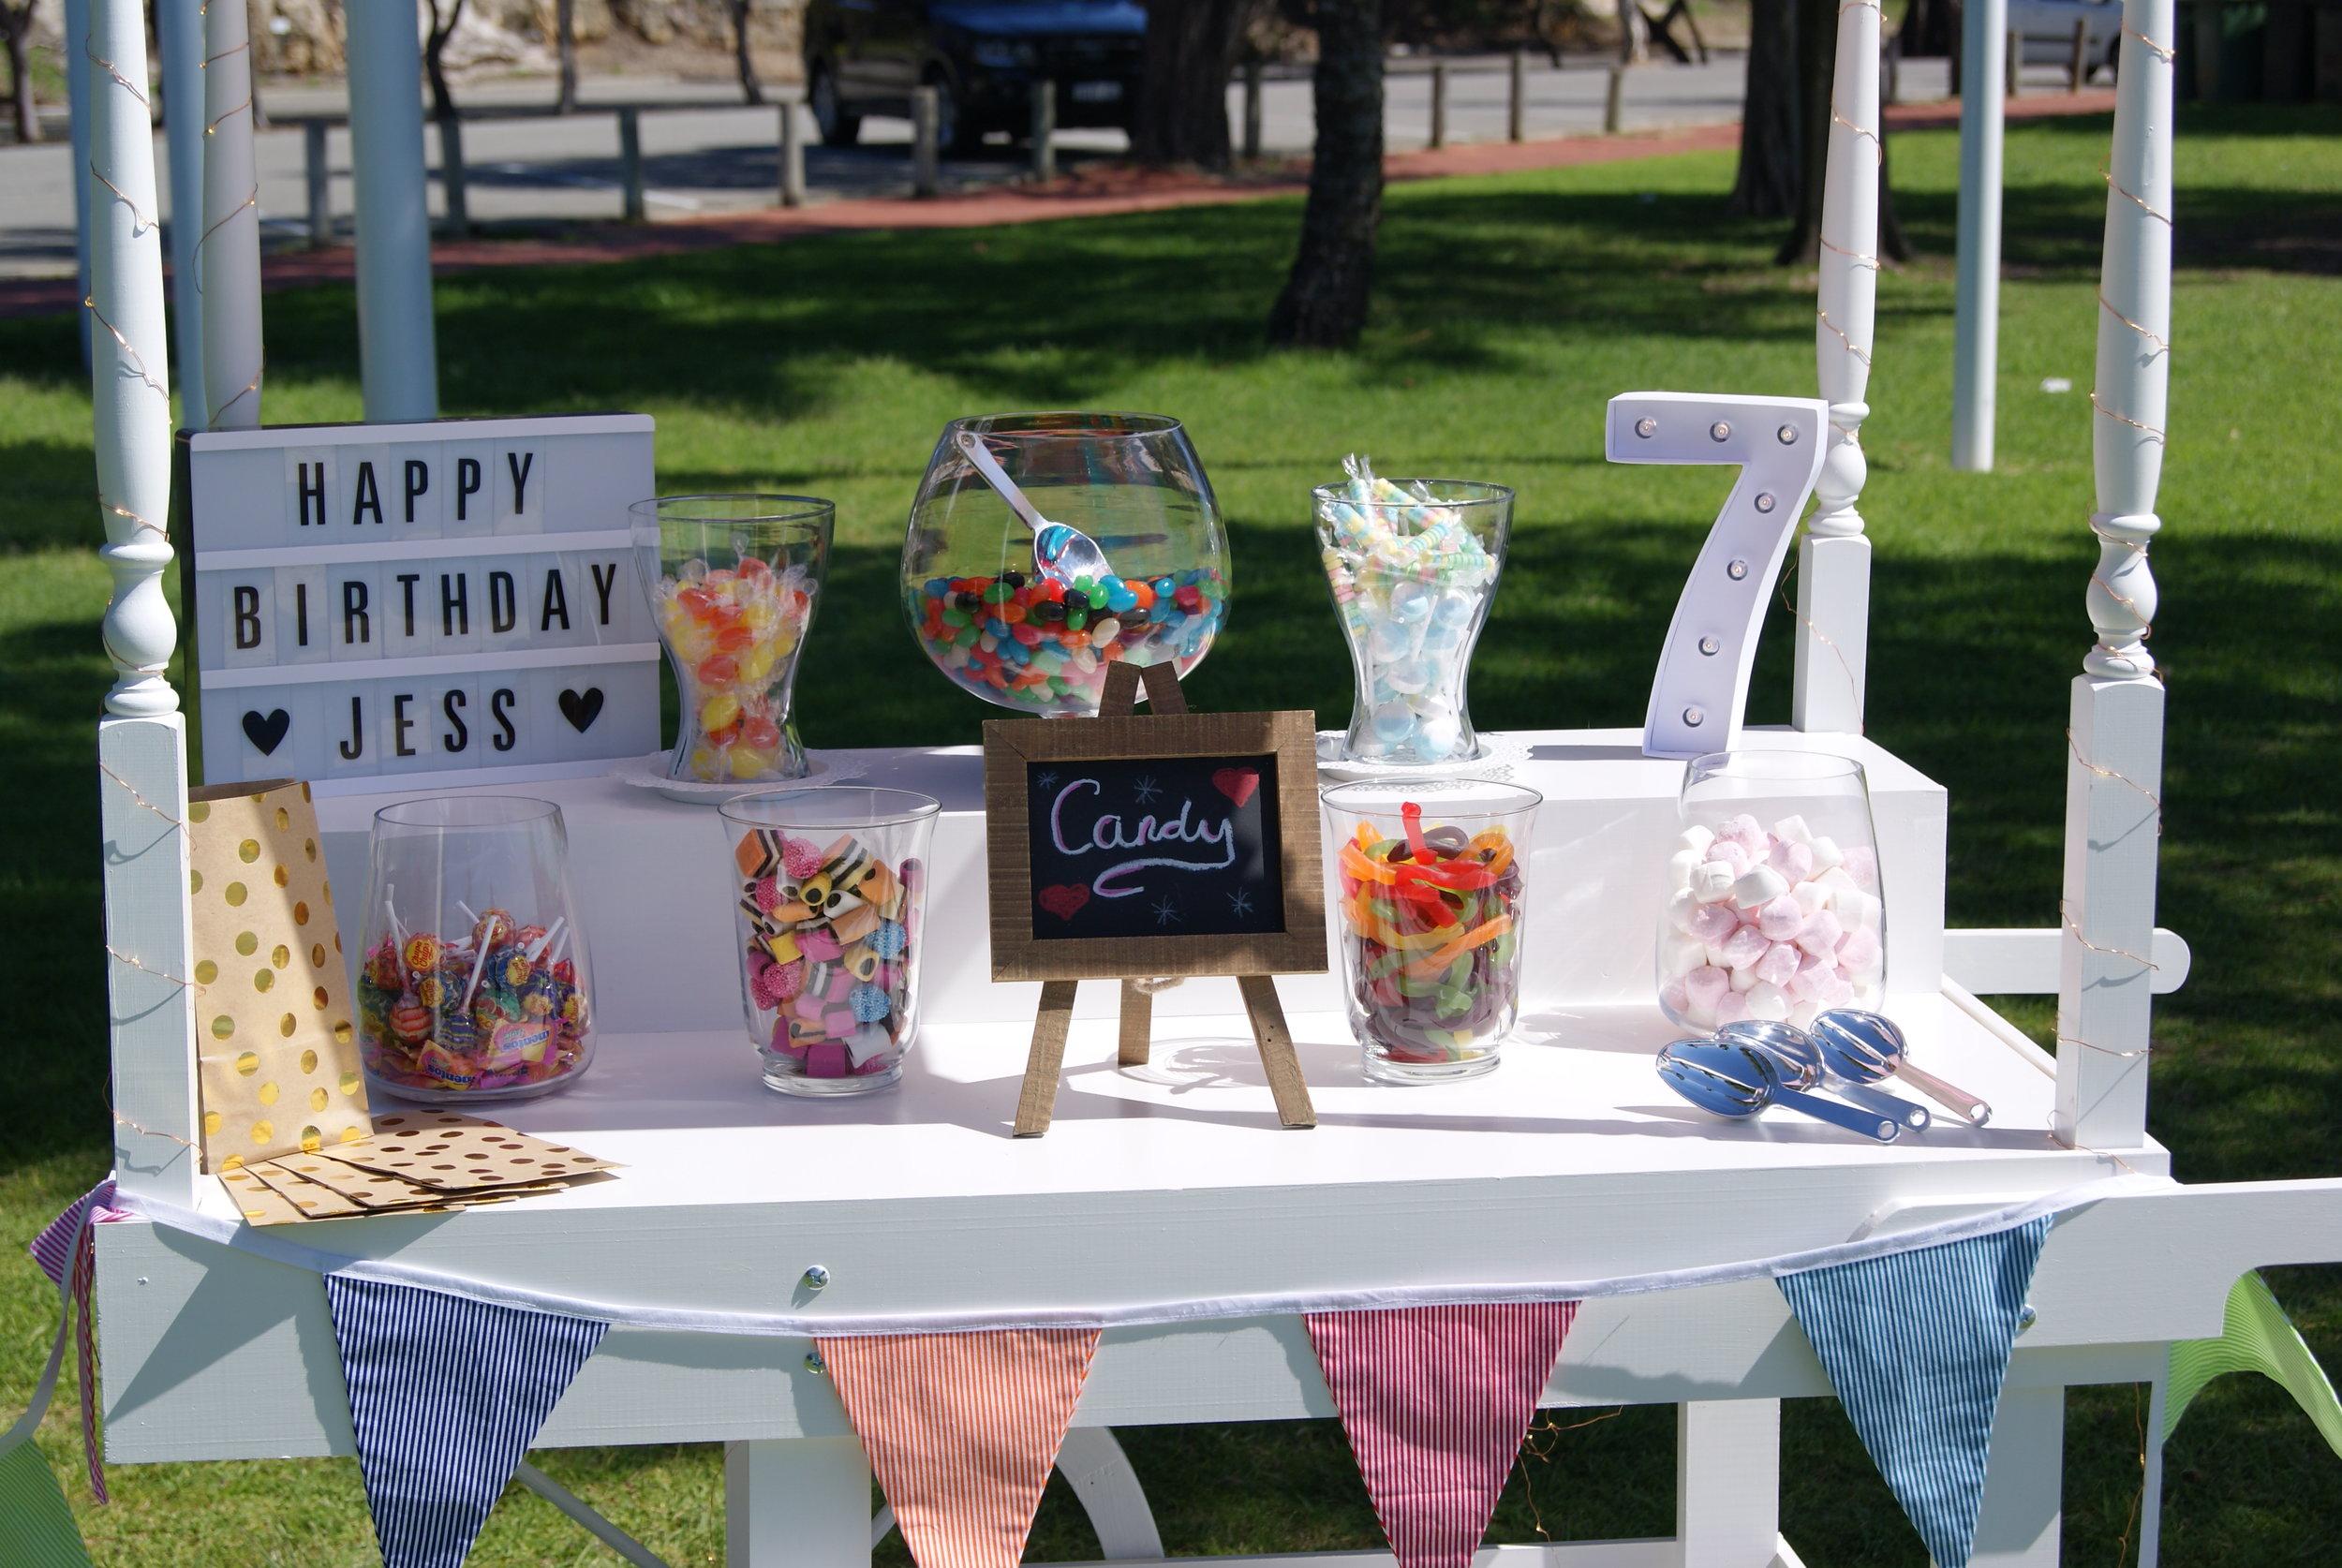 Birthday-candy-cart-hire-little-lolly-cart.JPG